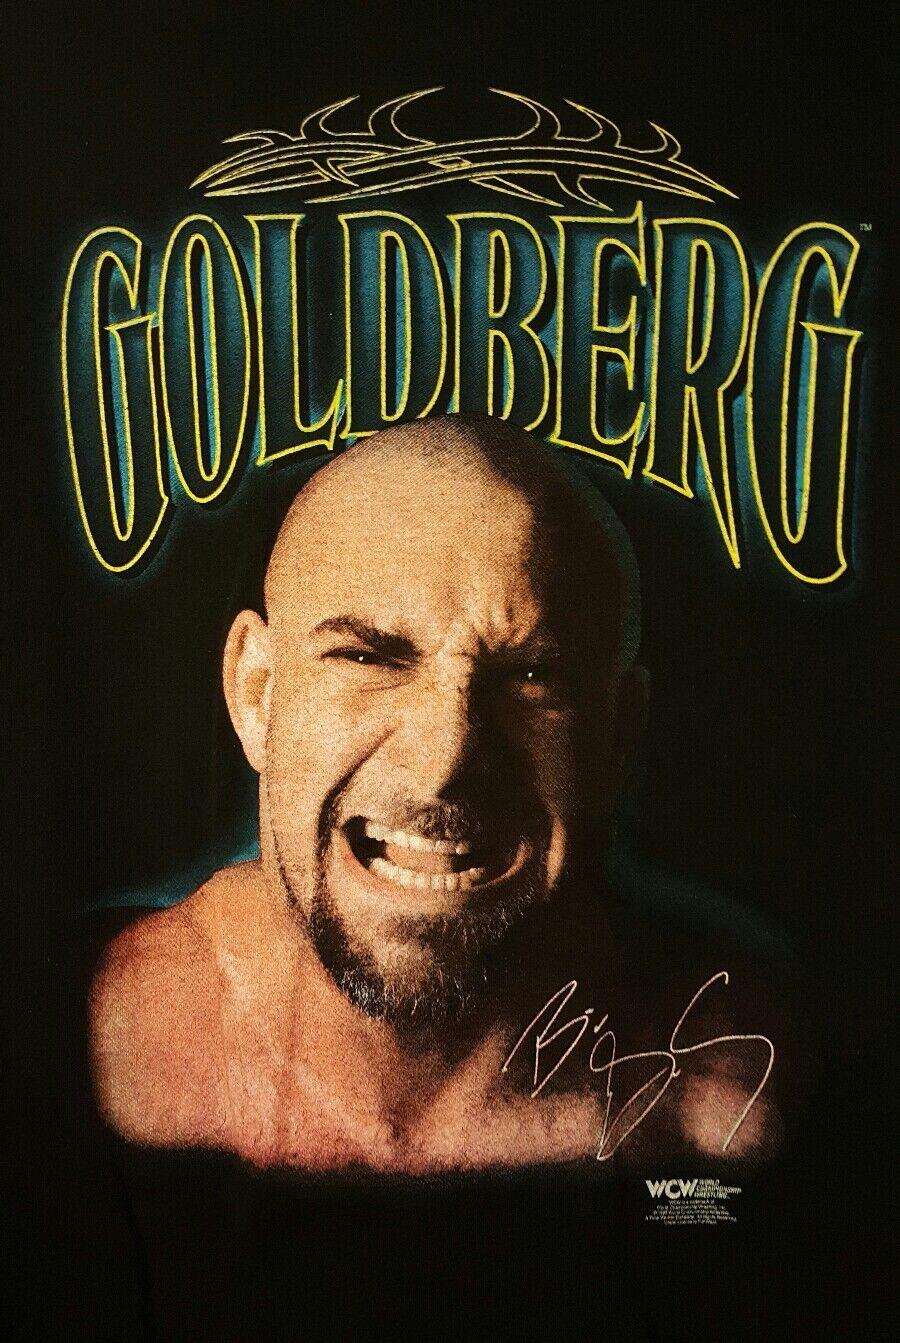 goldBERG PRE-OWNED 1998 WCW Wrestling Size XL T-Shirt